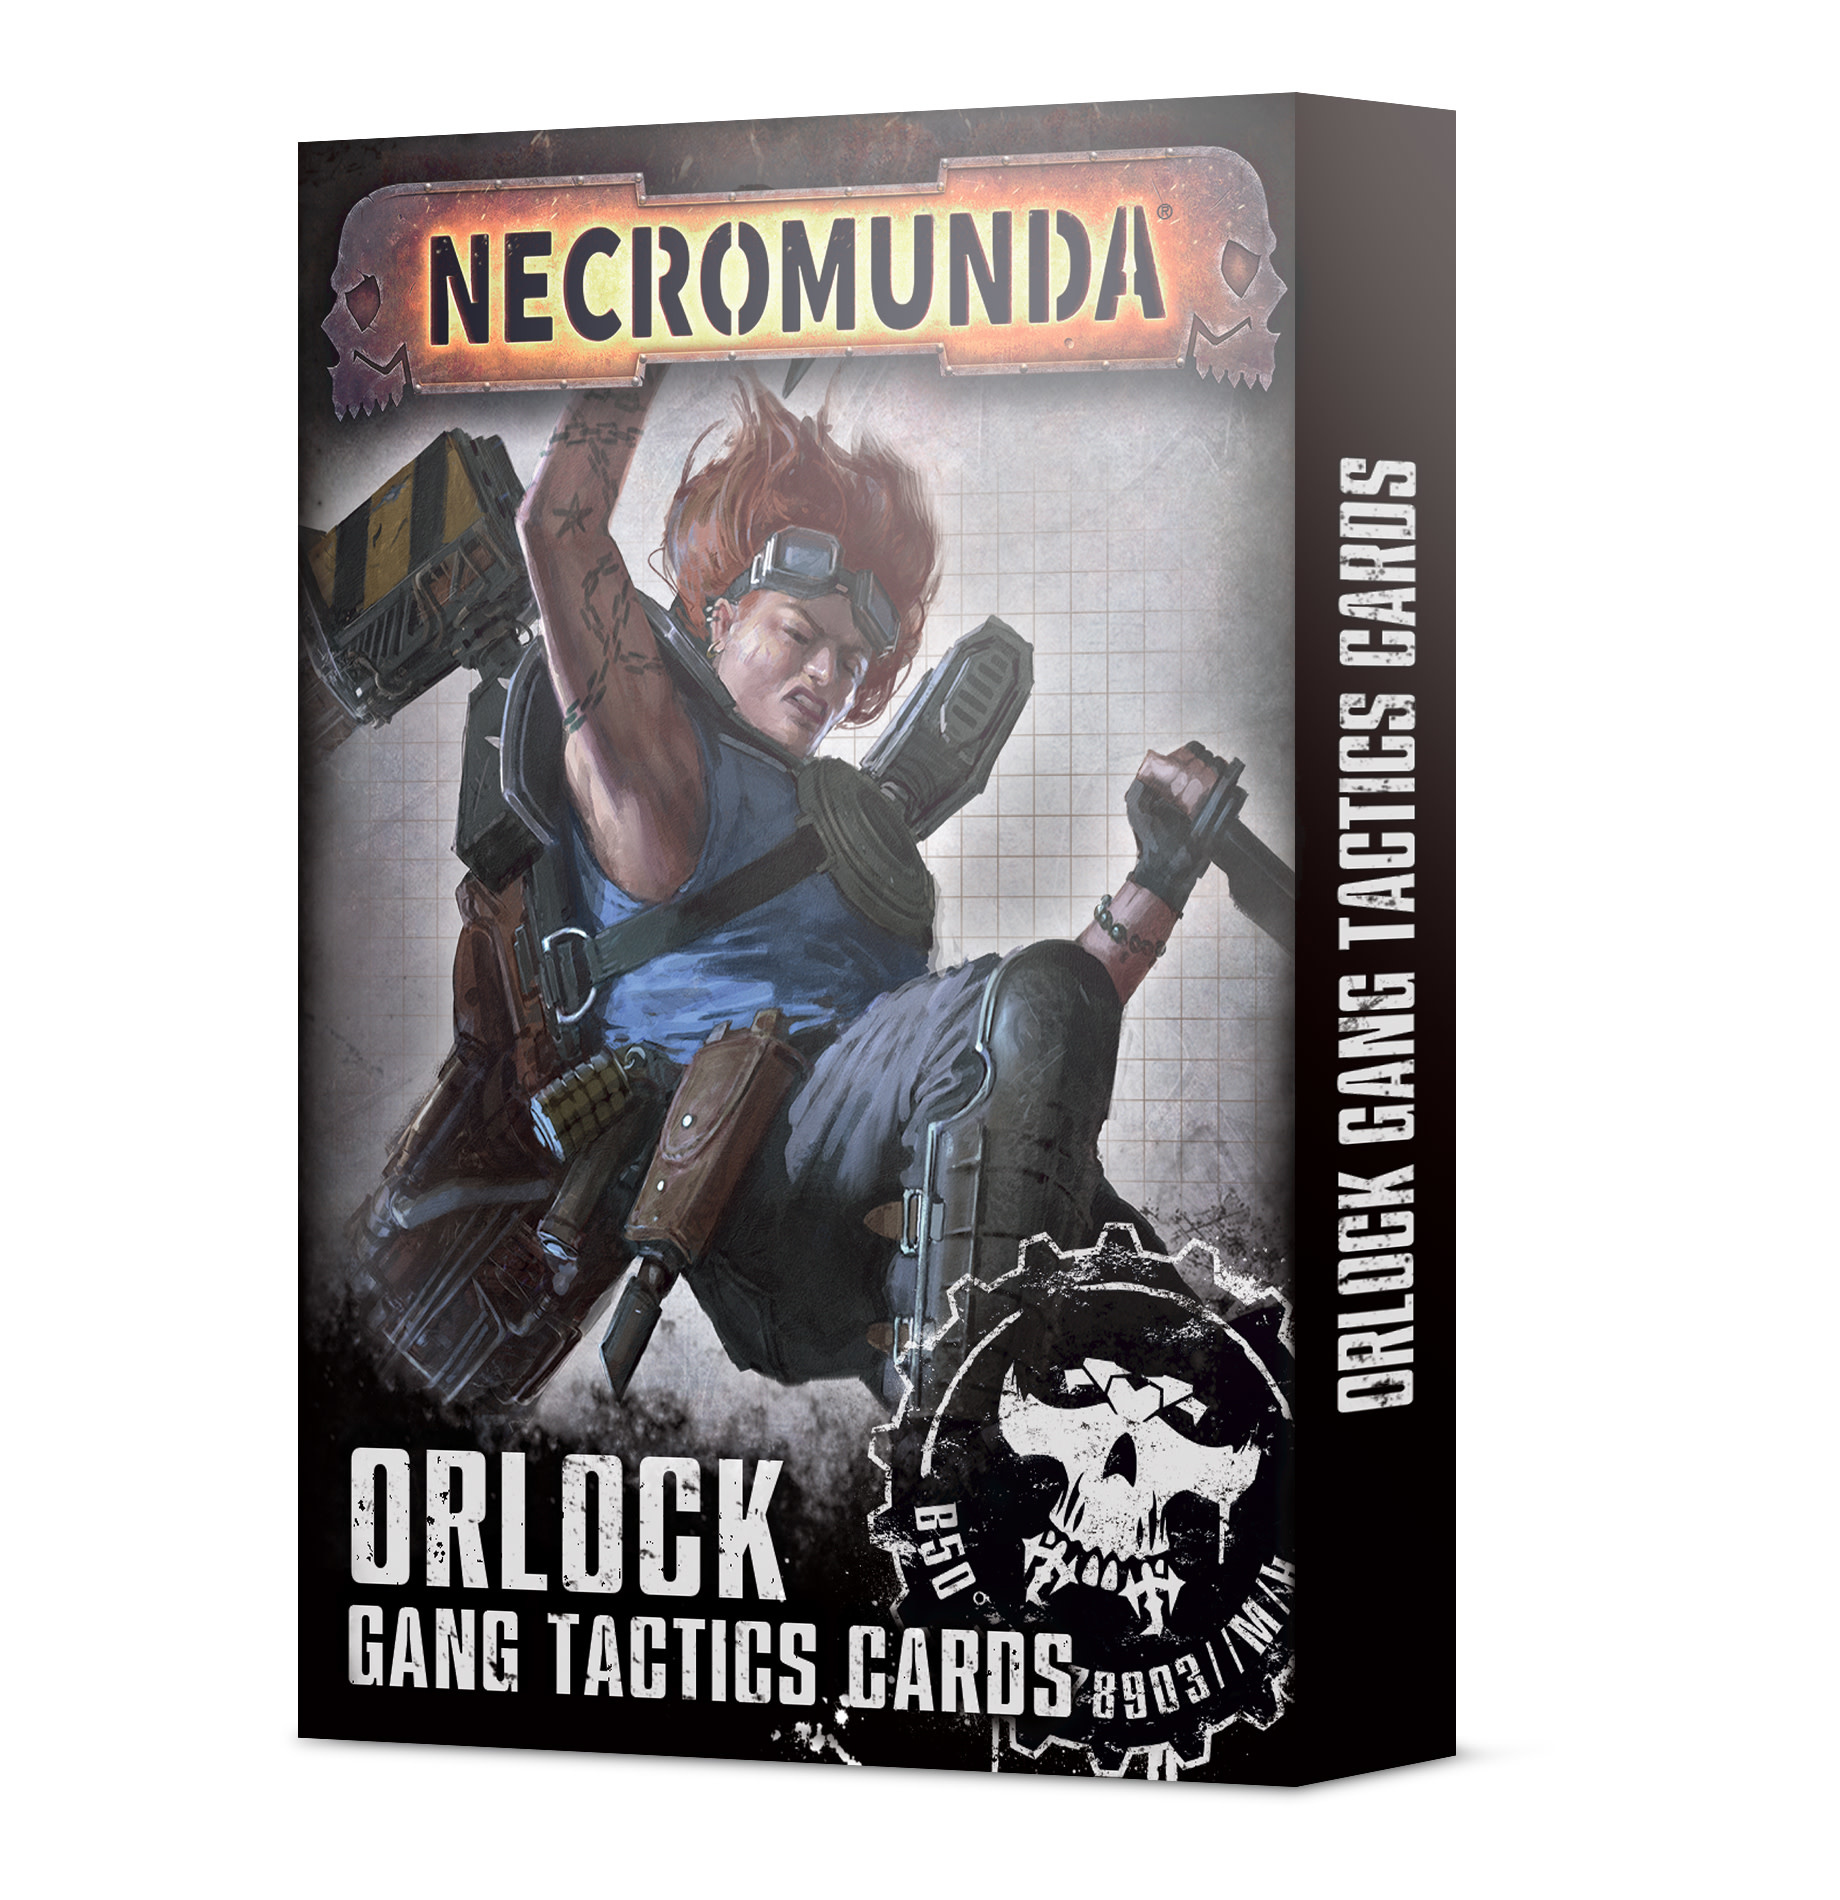 Games-Workshop Orlock Gang Tactics Cards